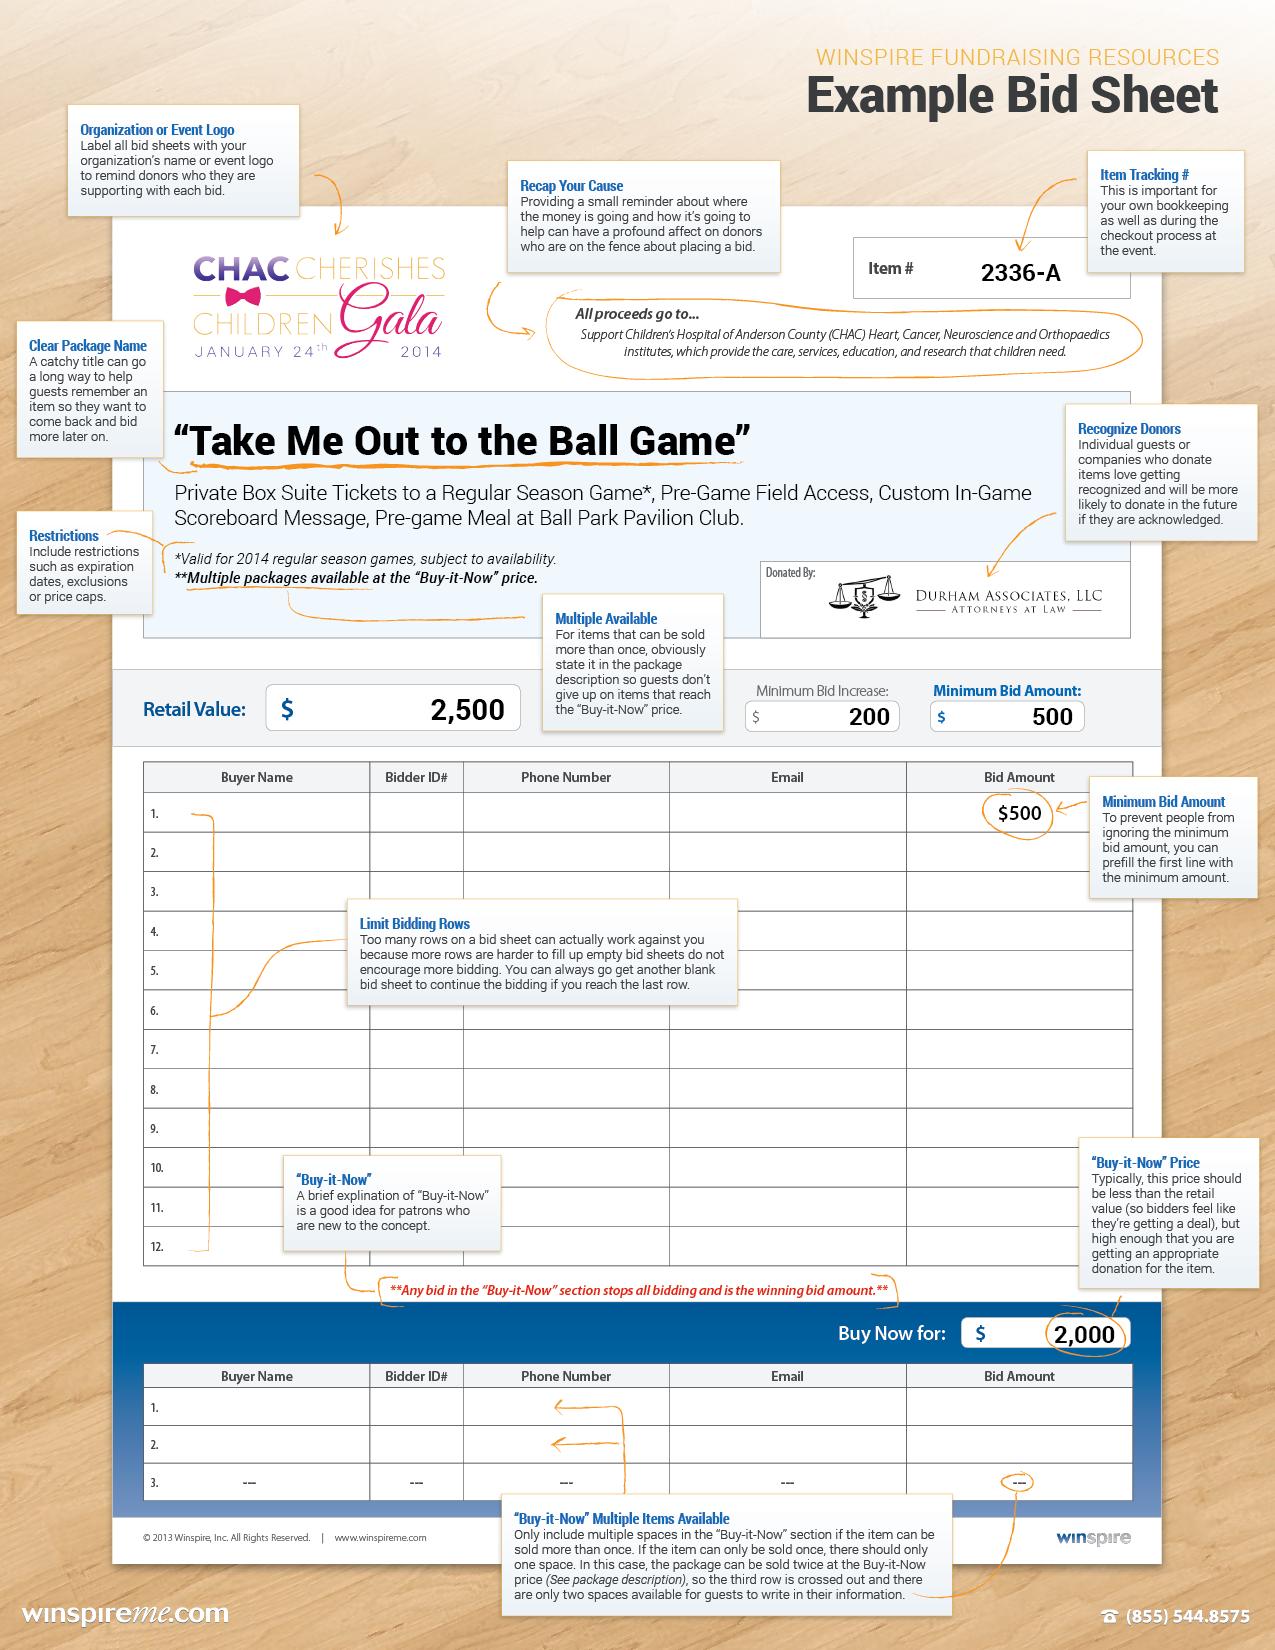 bid comparison spreadsheet with sheetd templates